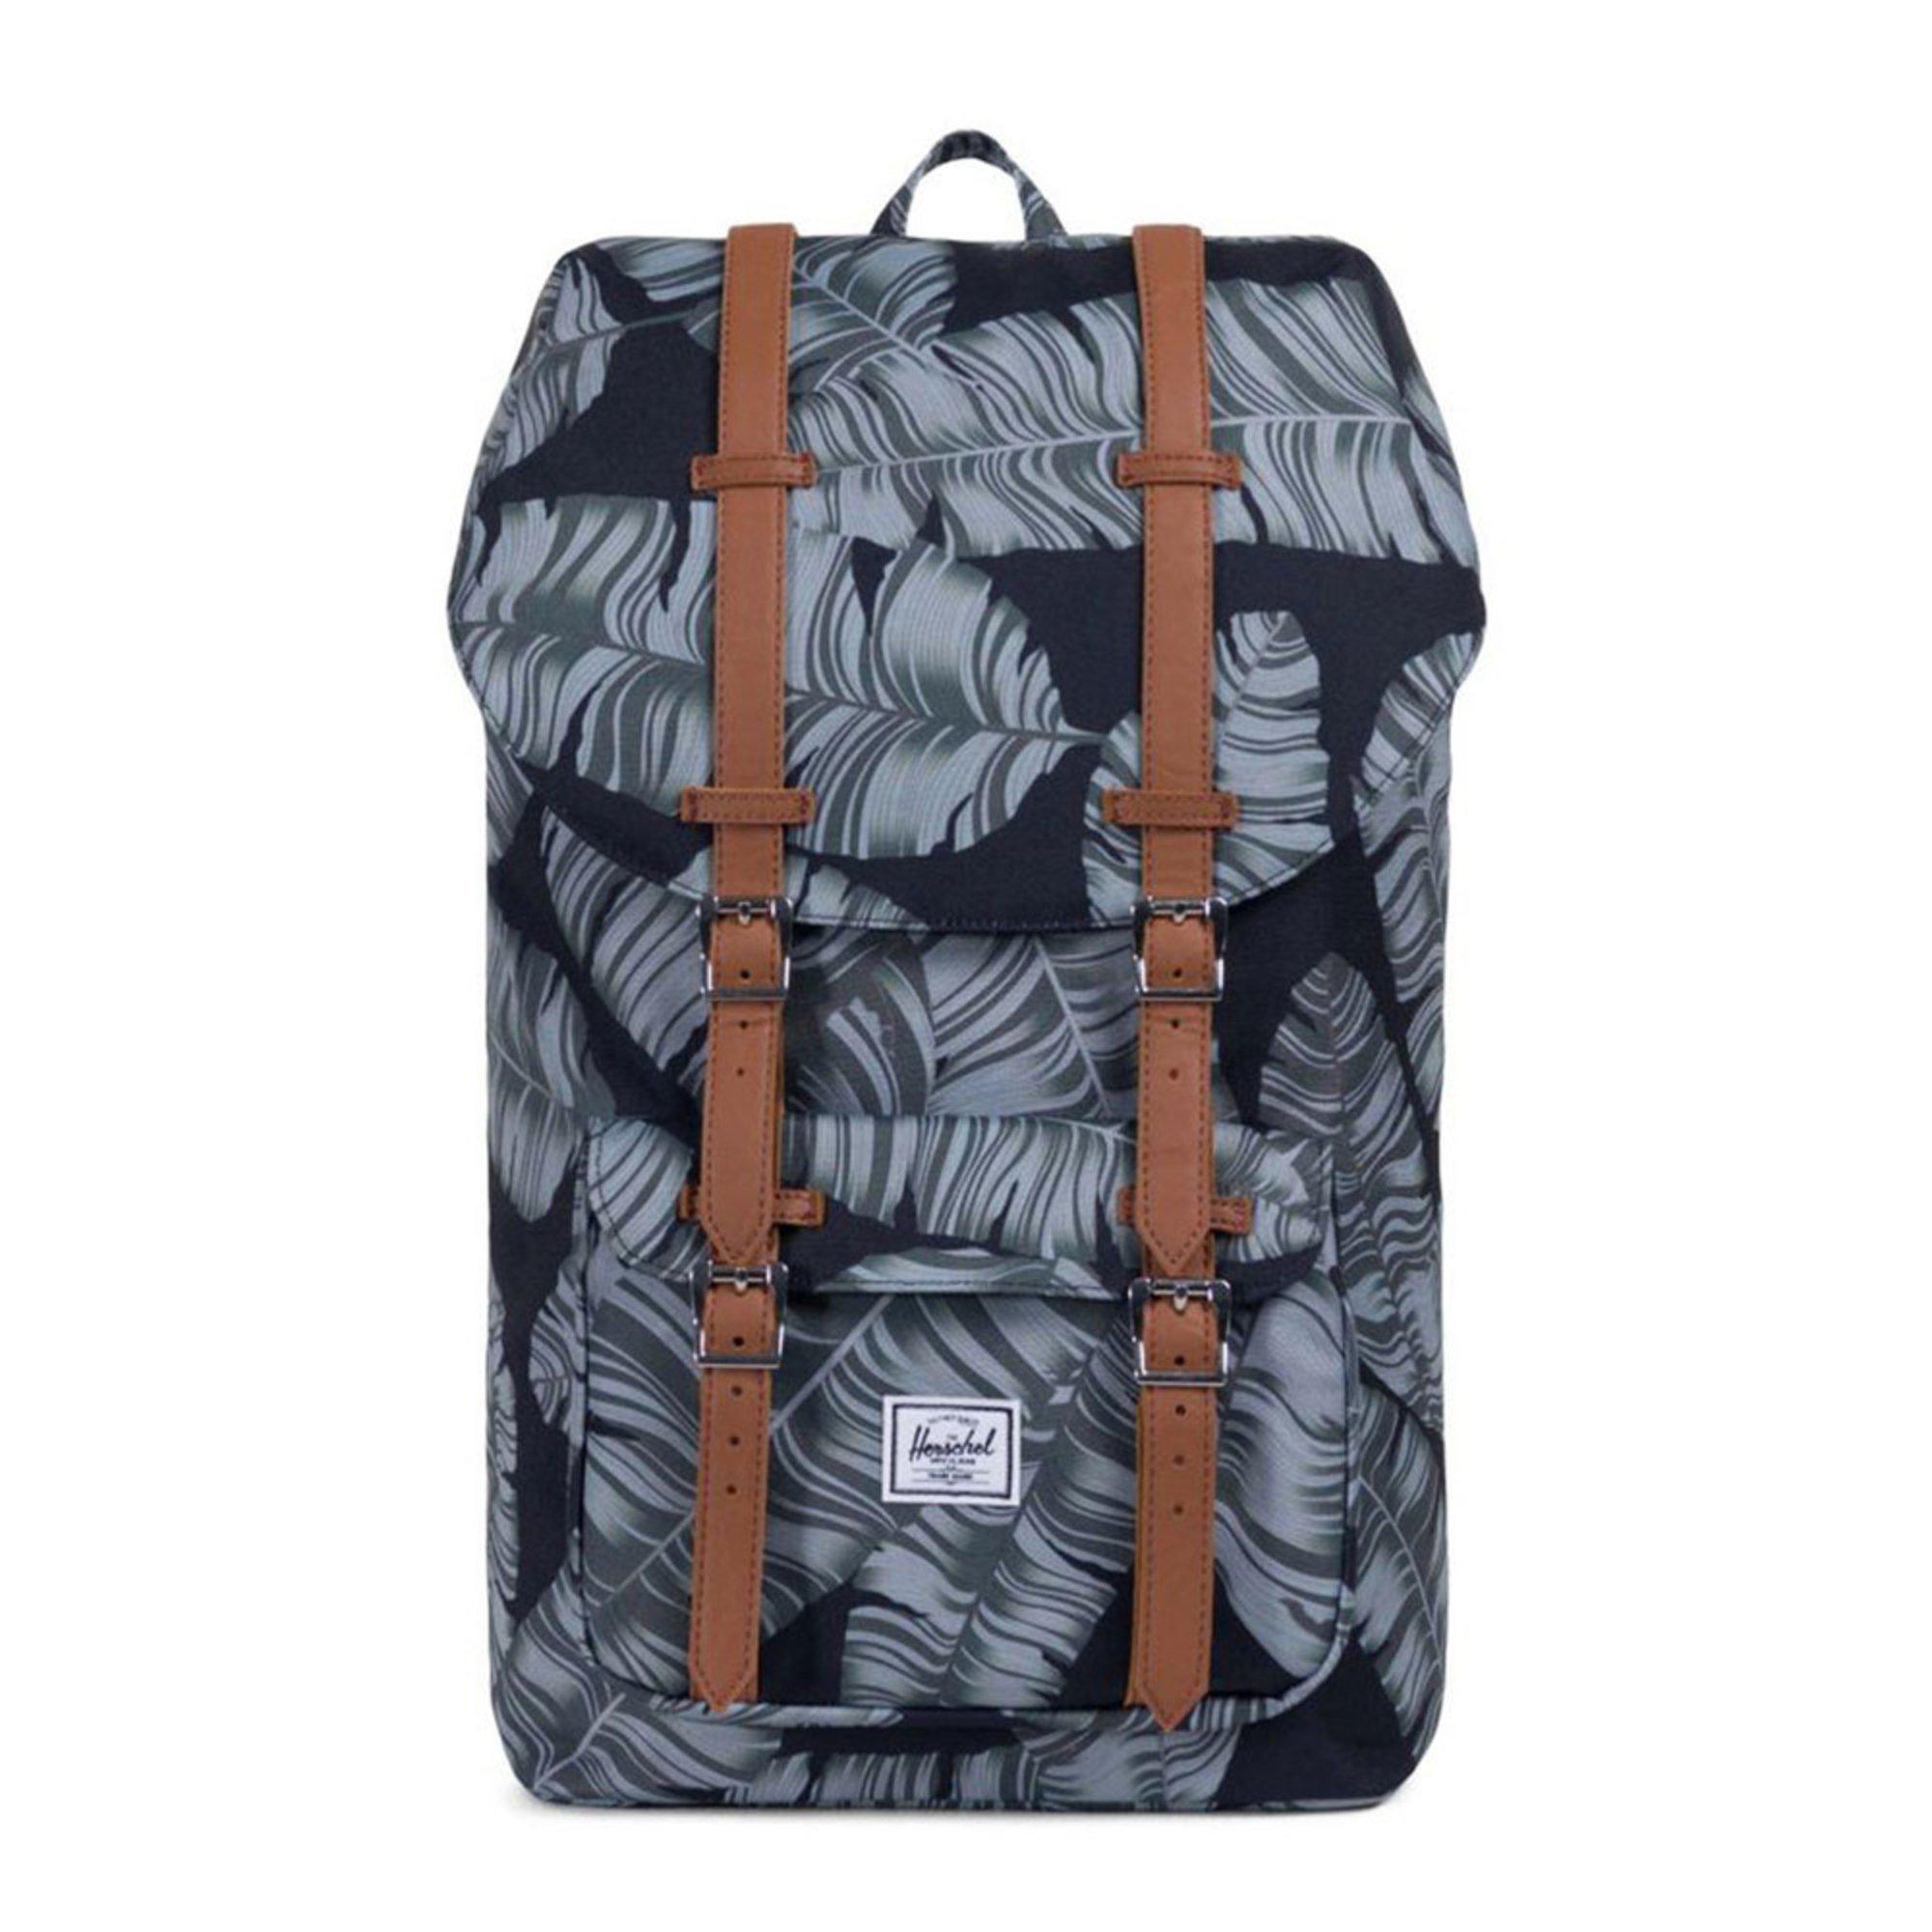 Herschel Little America Backpack- Black Palm  8f818ea2a62d4